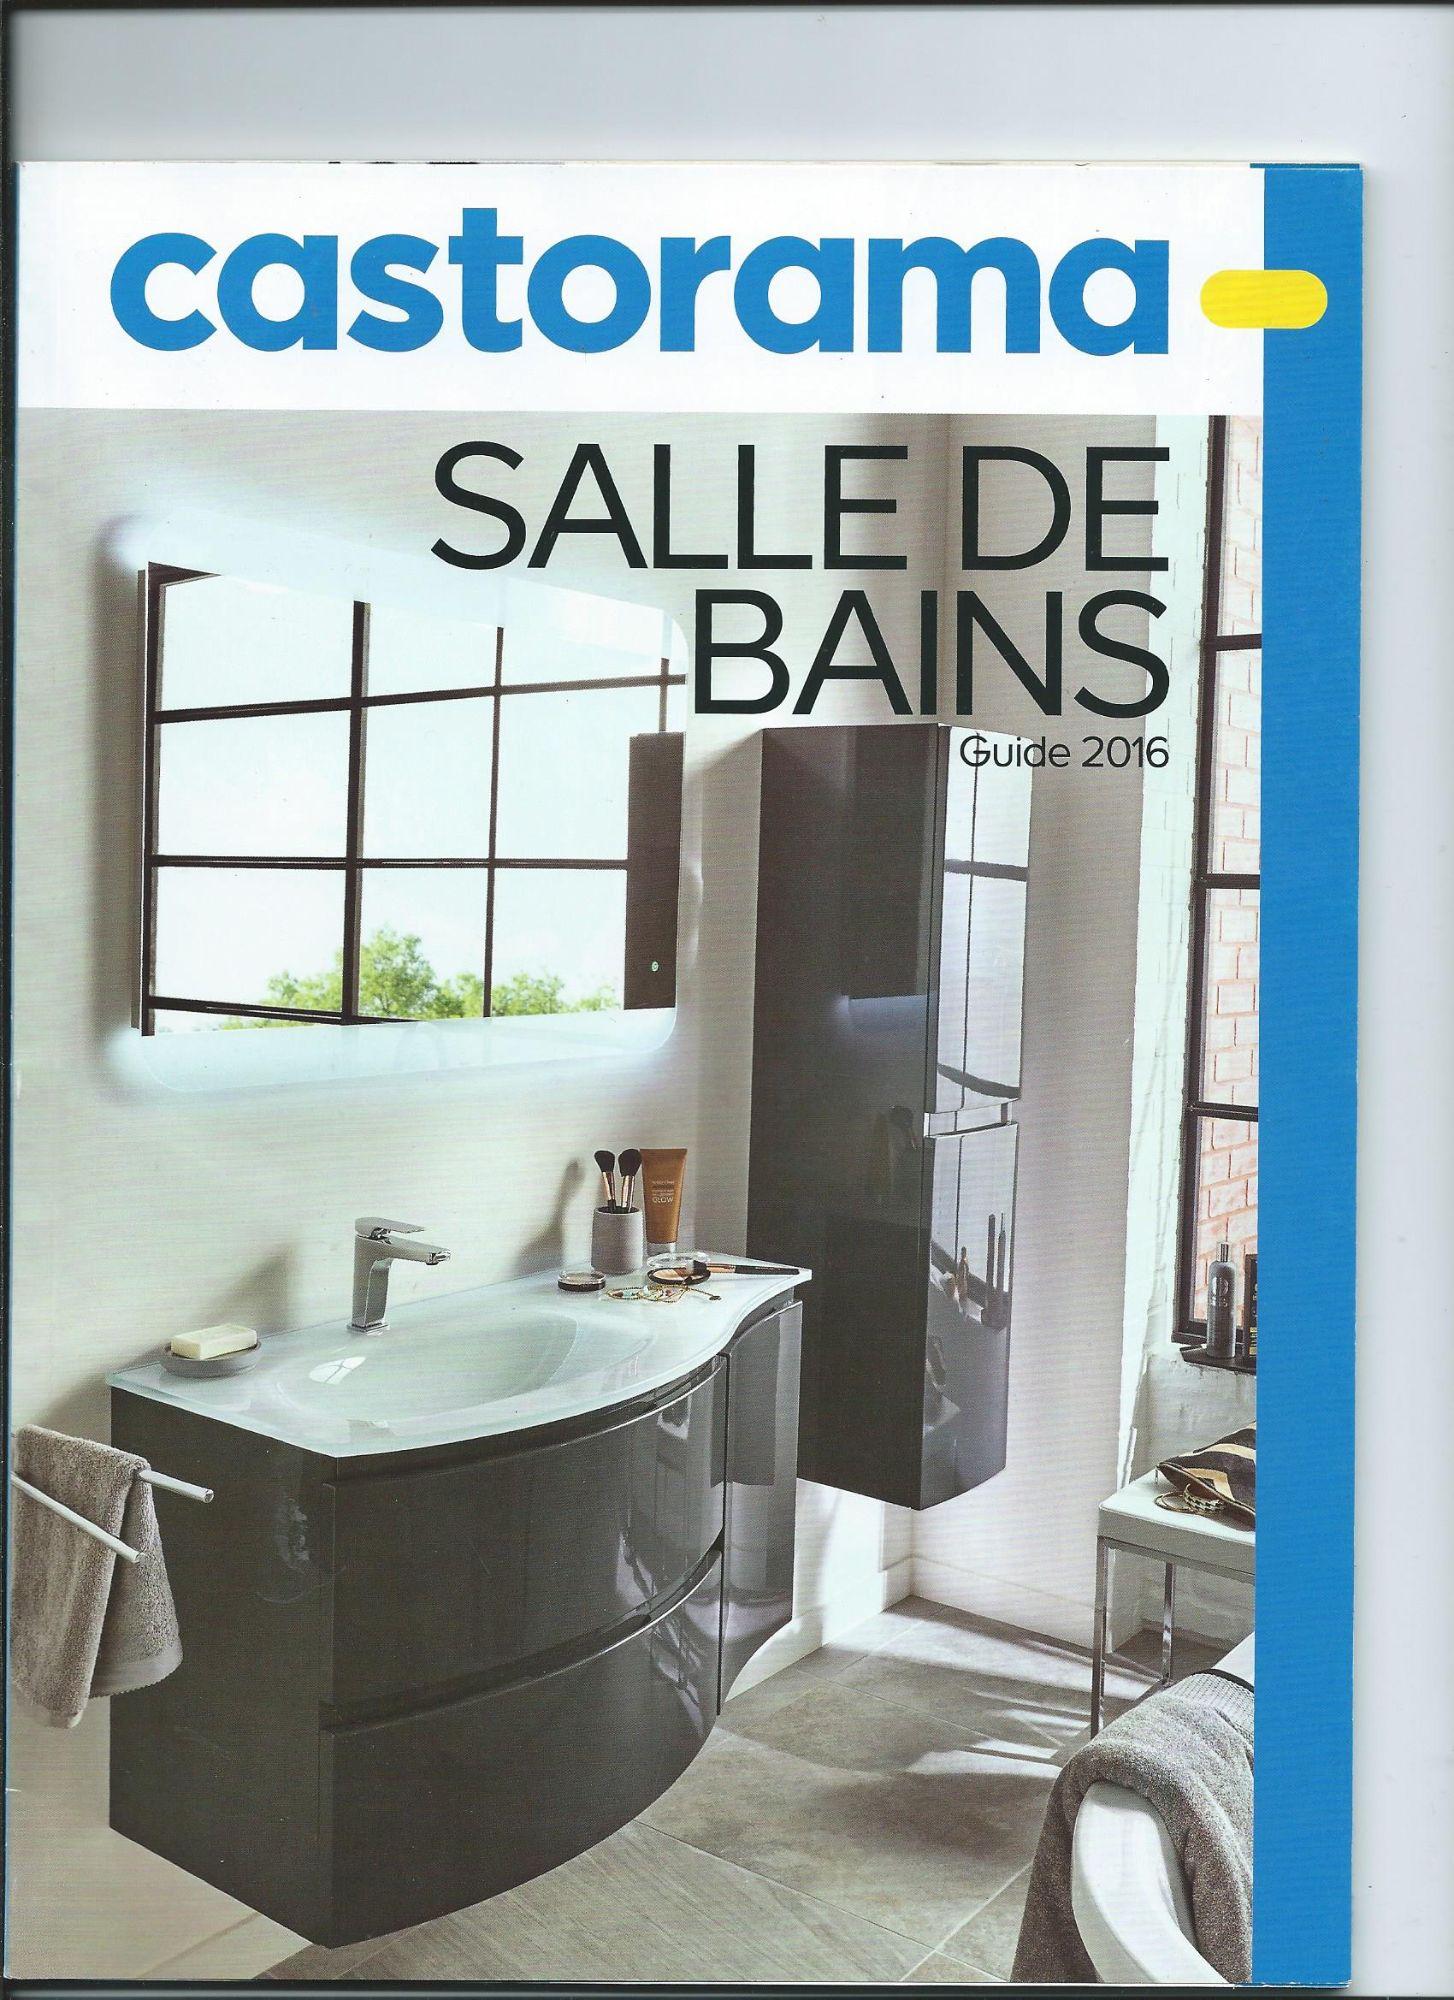 Catalogue Castorama Salle De Bains Guide 2016 à Stickers Salle De Bain Castorama